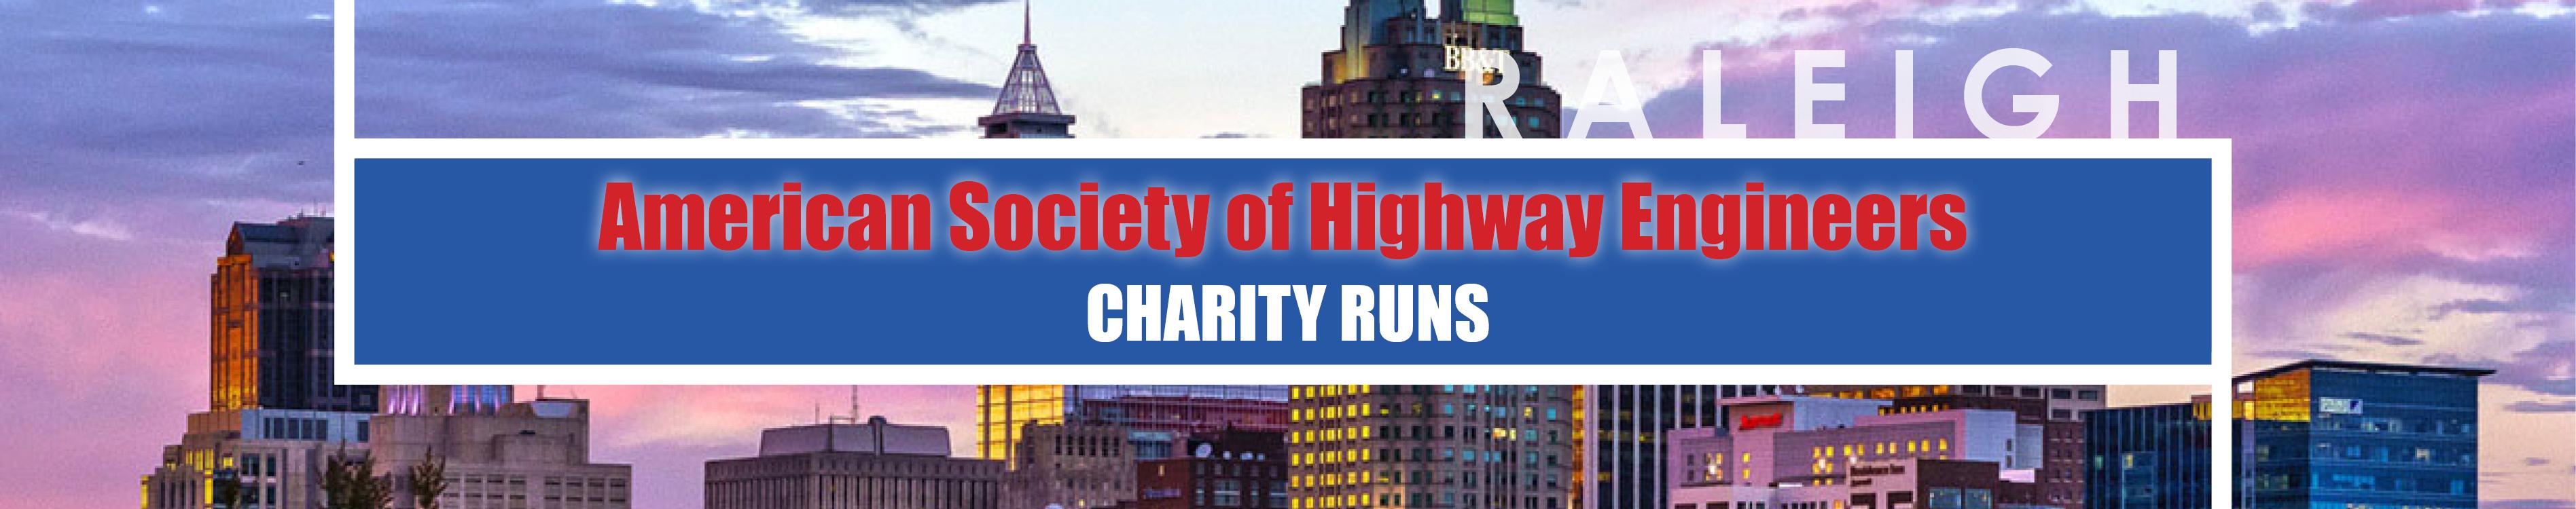 Charity Runs